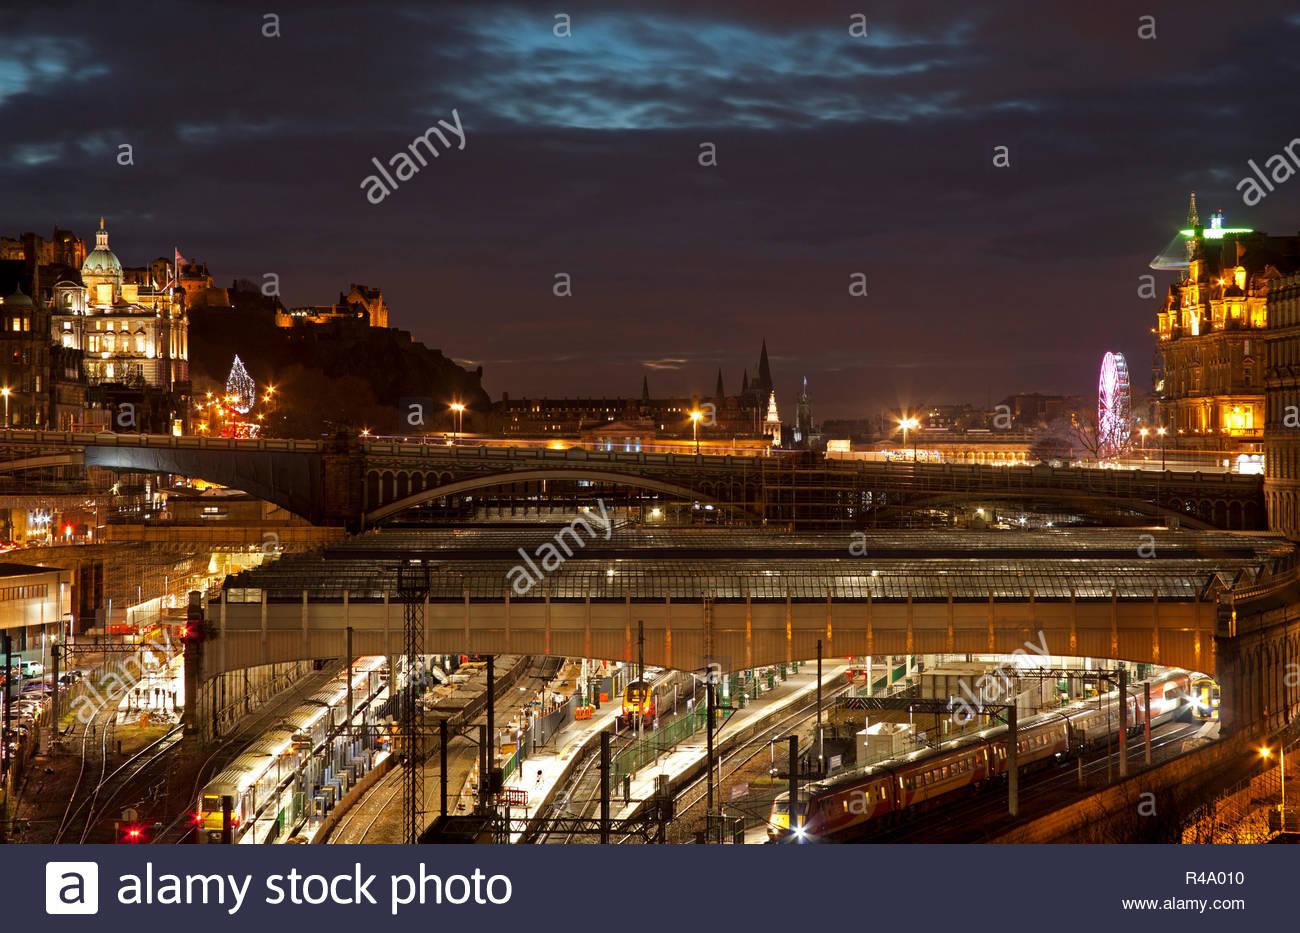 Edinburgh, Scotland, UK. 26 Nov. 2018. Weather, a calm cloudy dusk over Edinburgh city centre with trains in Waverley station. Stock Photo